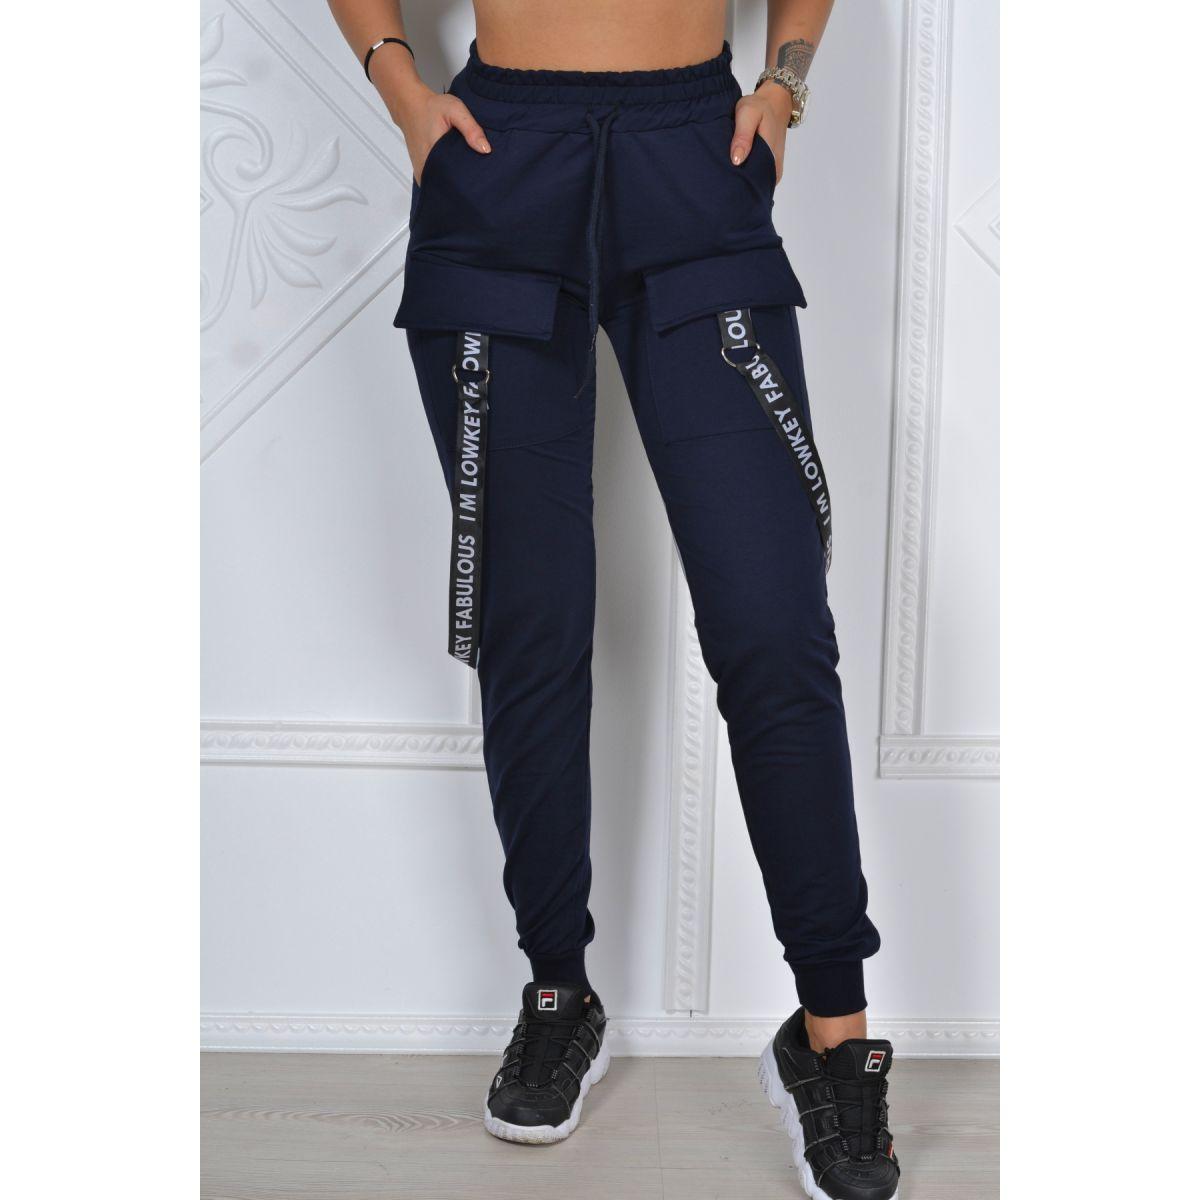 Pantaloni cod : 4937